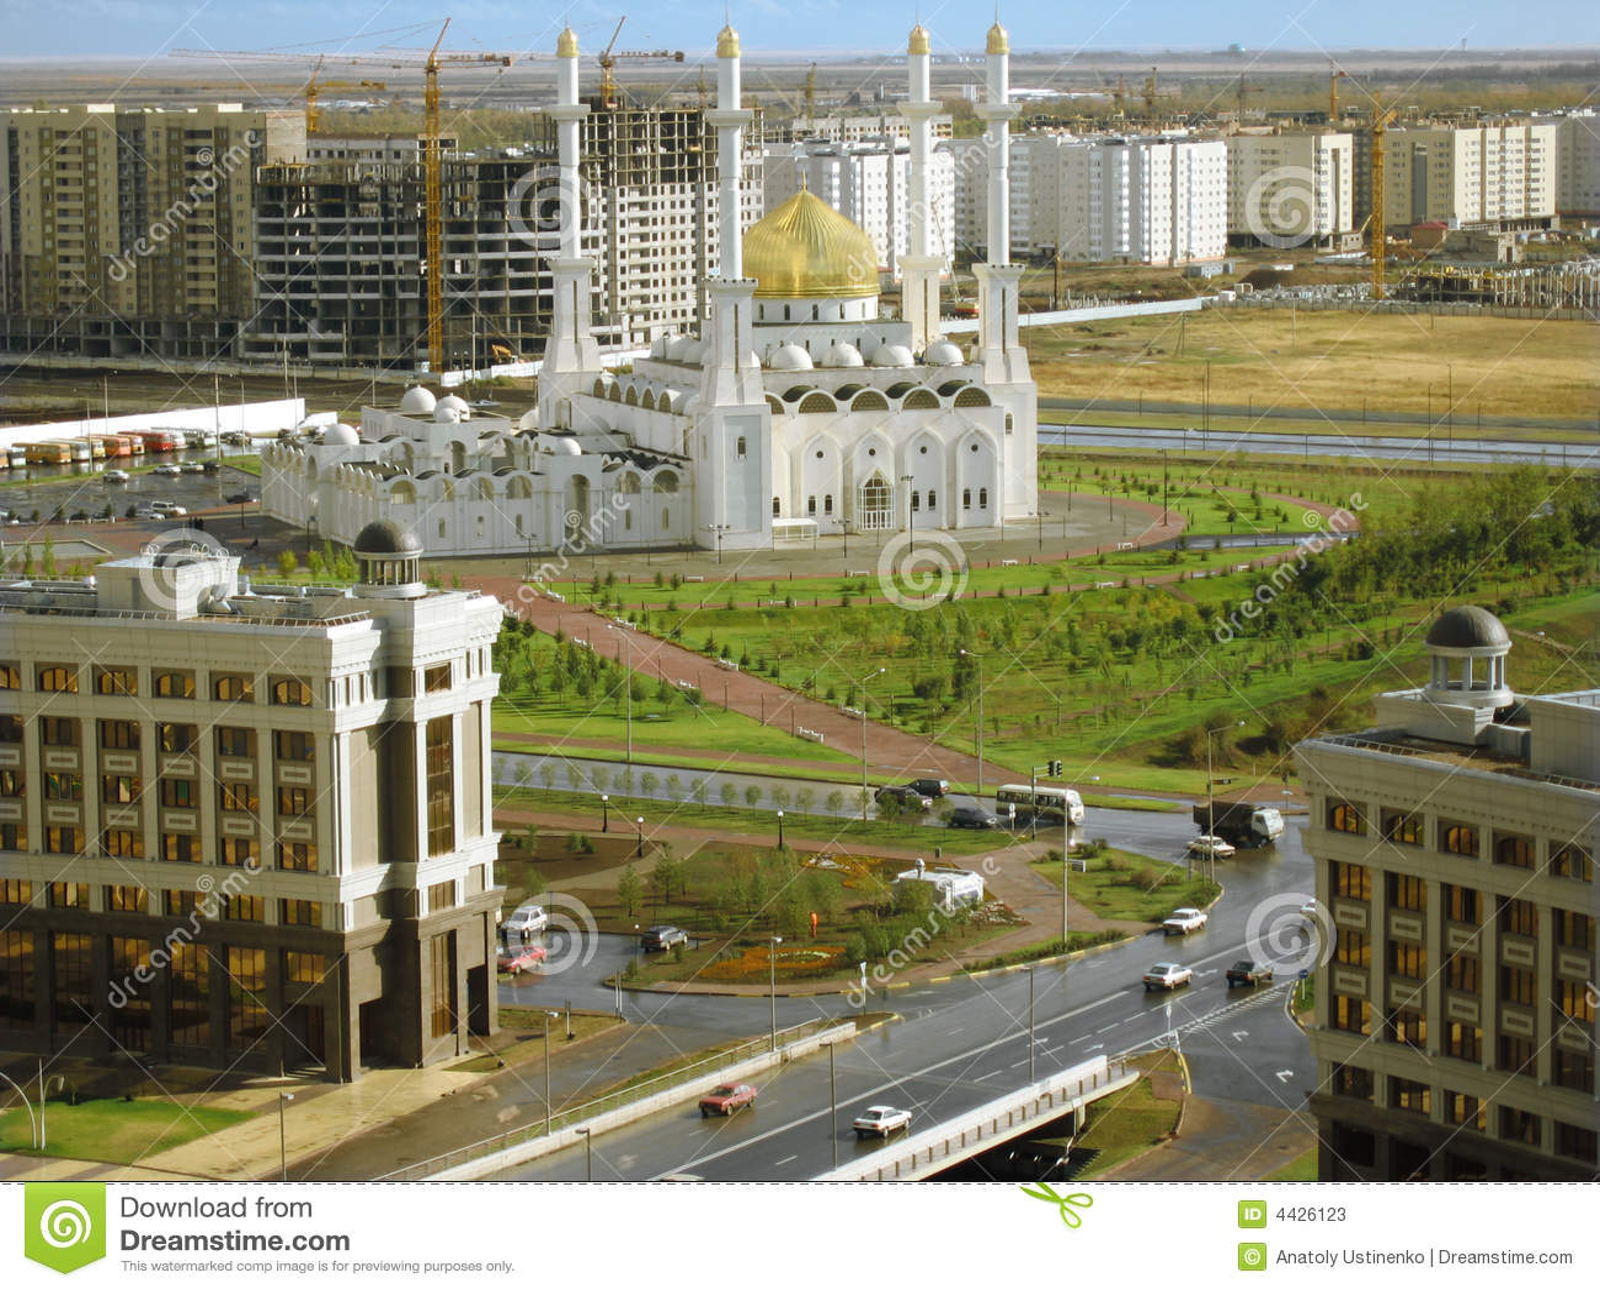 Astana-Stadt. Moschee. Panorama